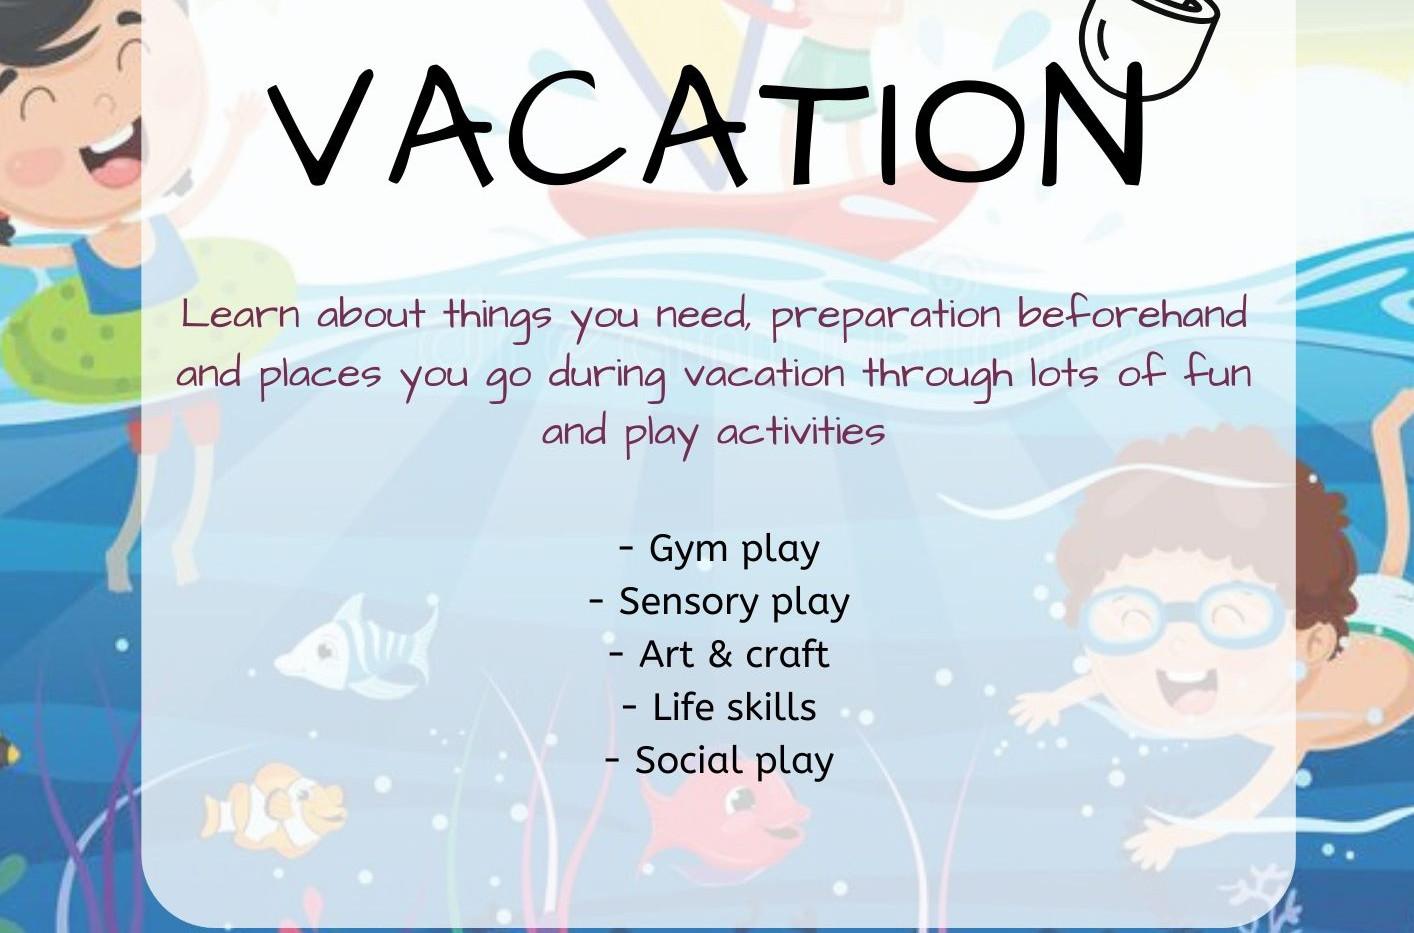 Vacation_July.jpg